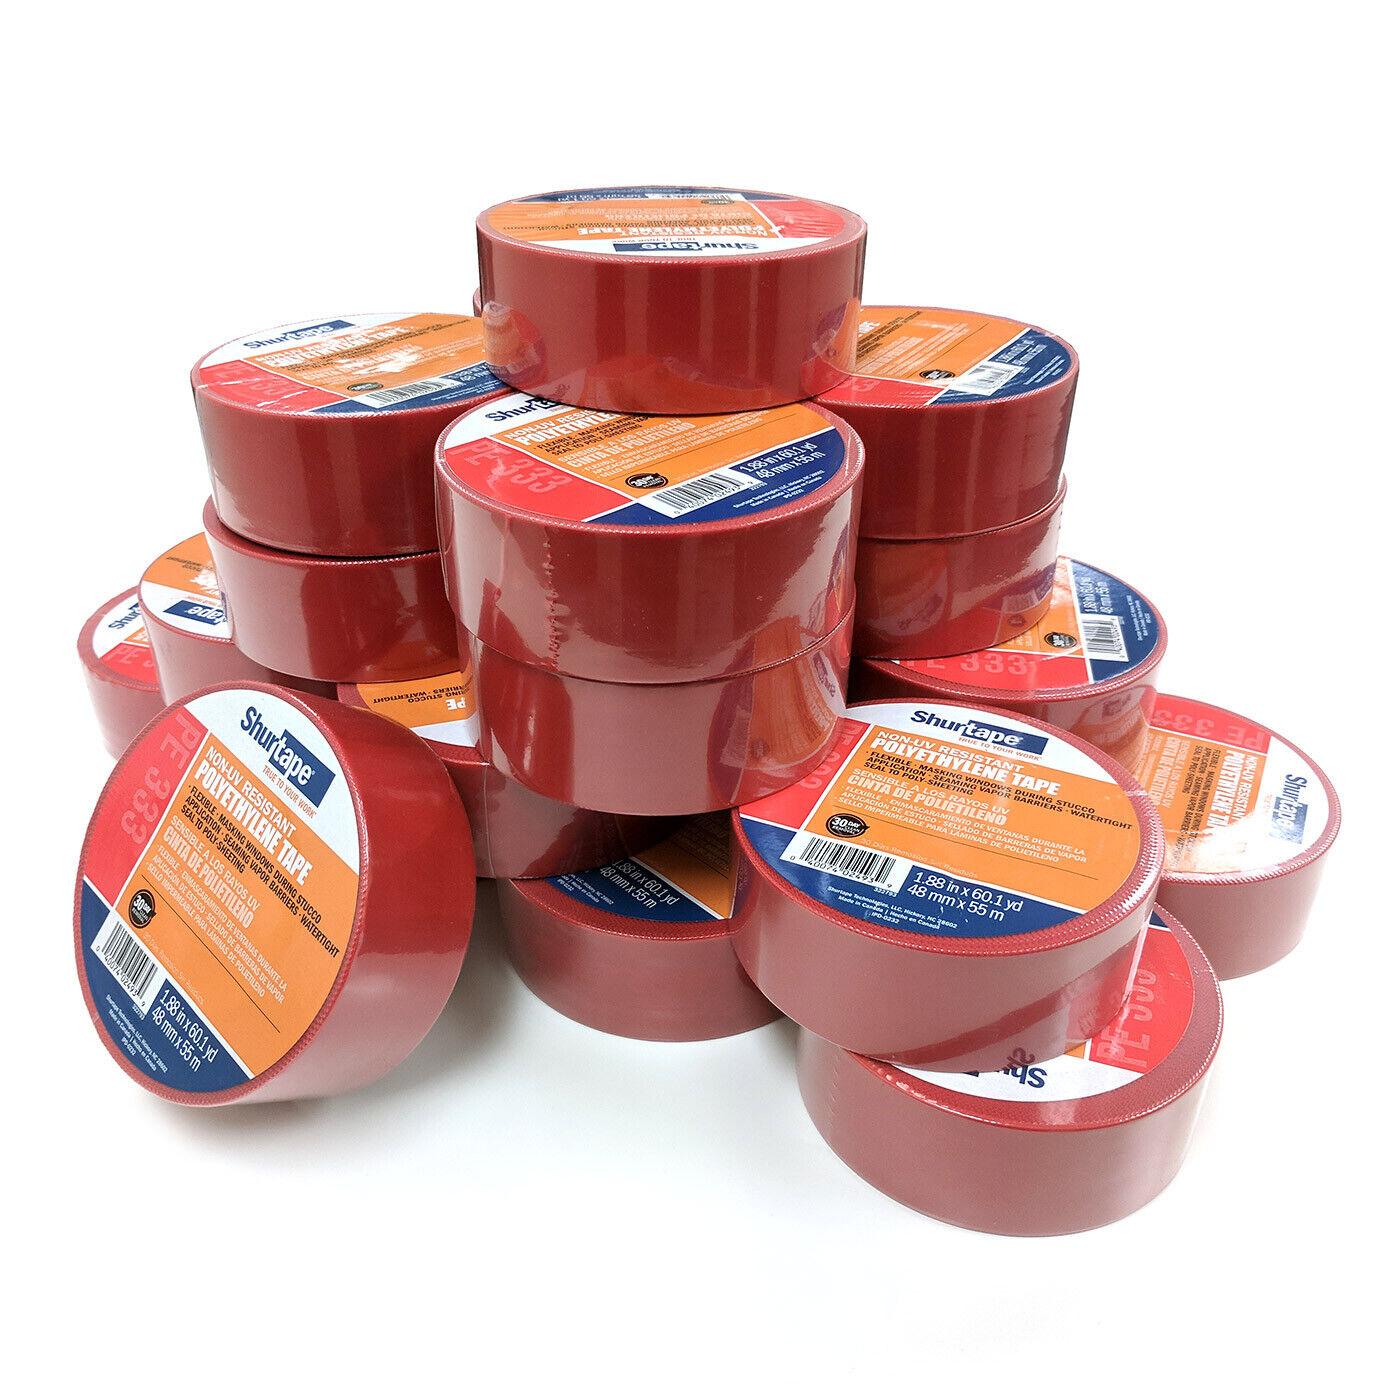 2 in Shurtape PE-333 Economy Stucco Masking Film Tape Red//Serrated x 60 yds.